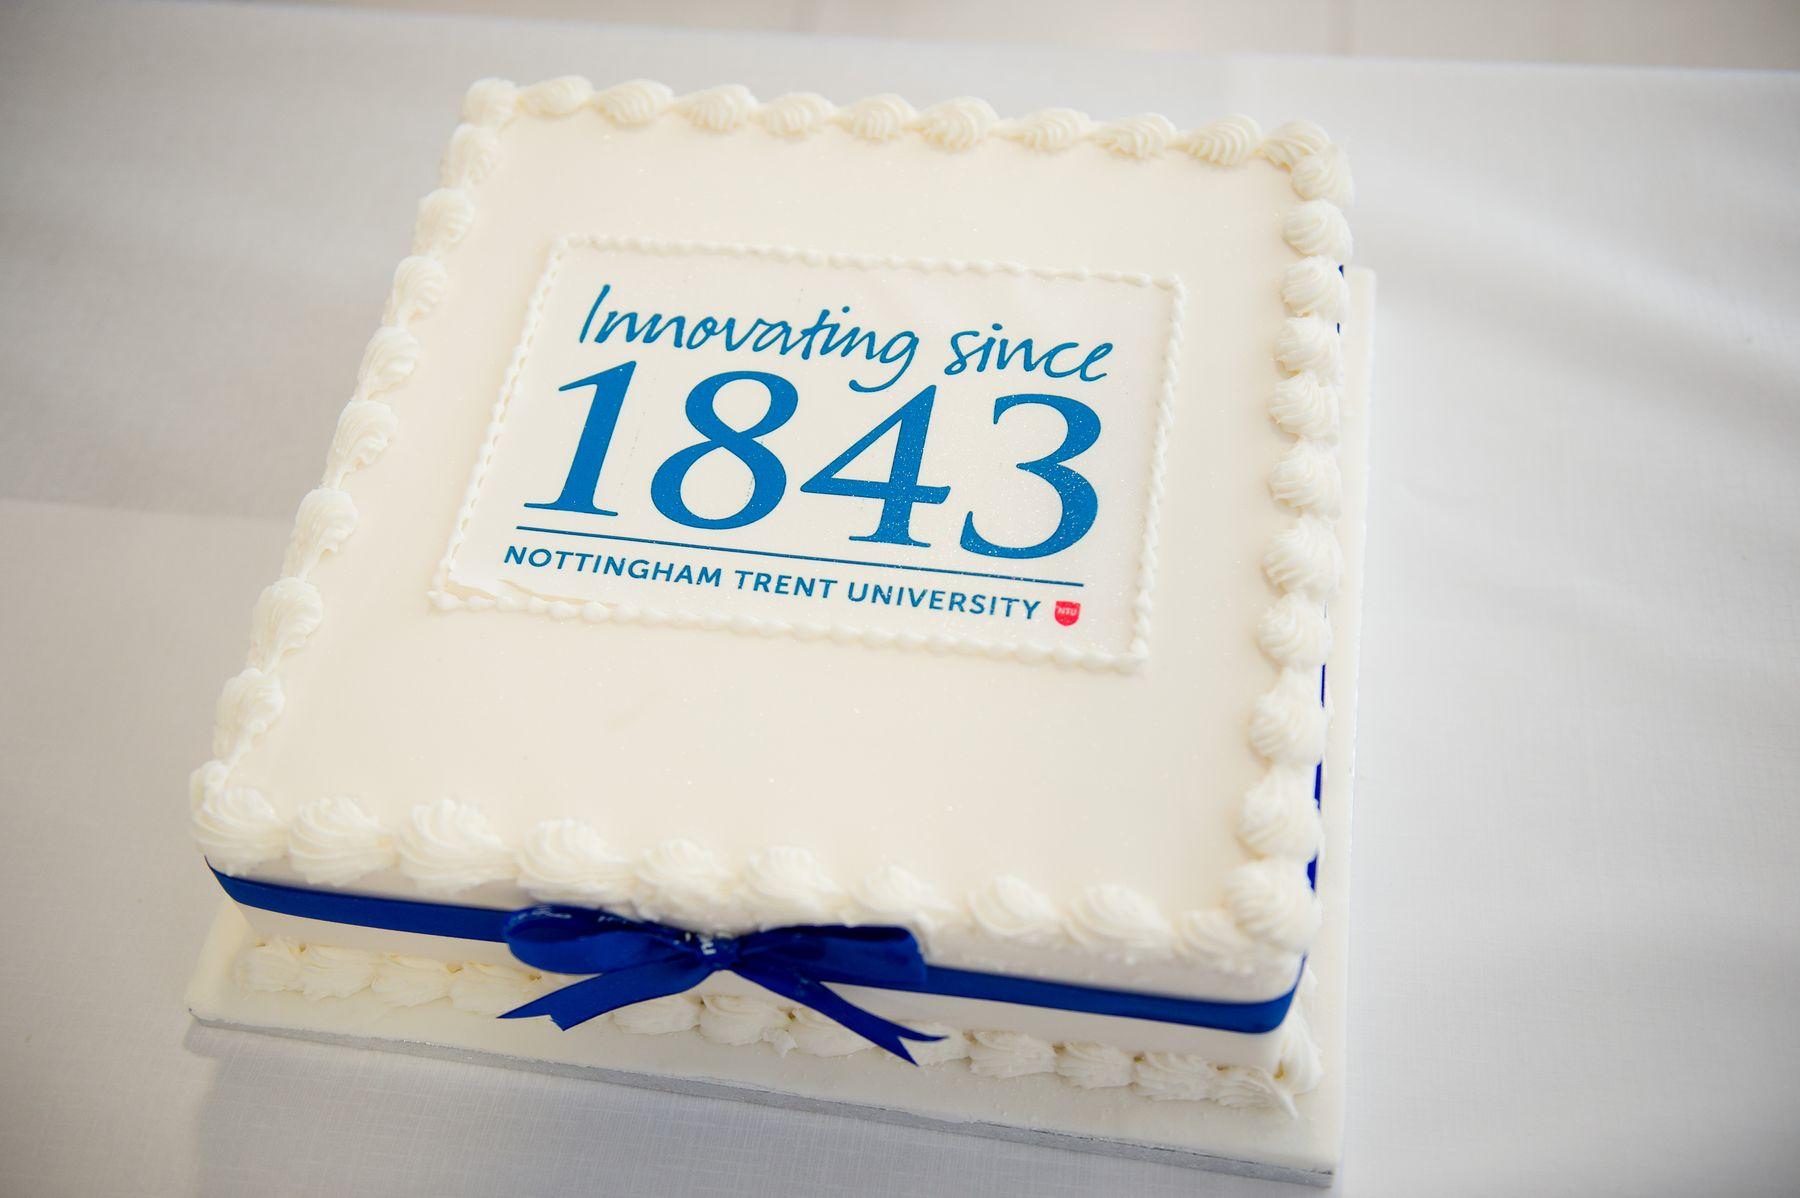 1843 Cake